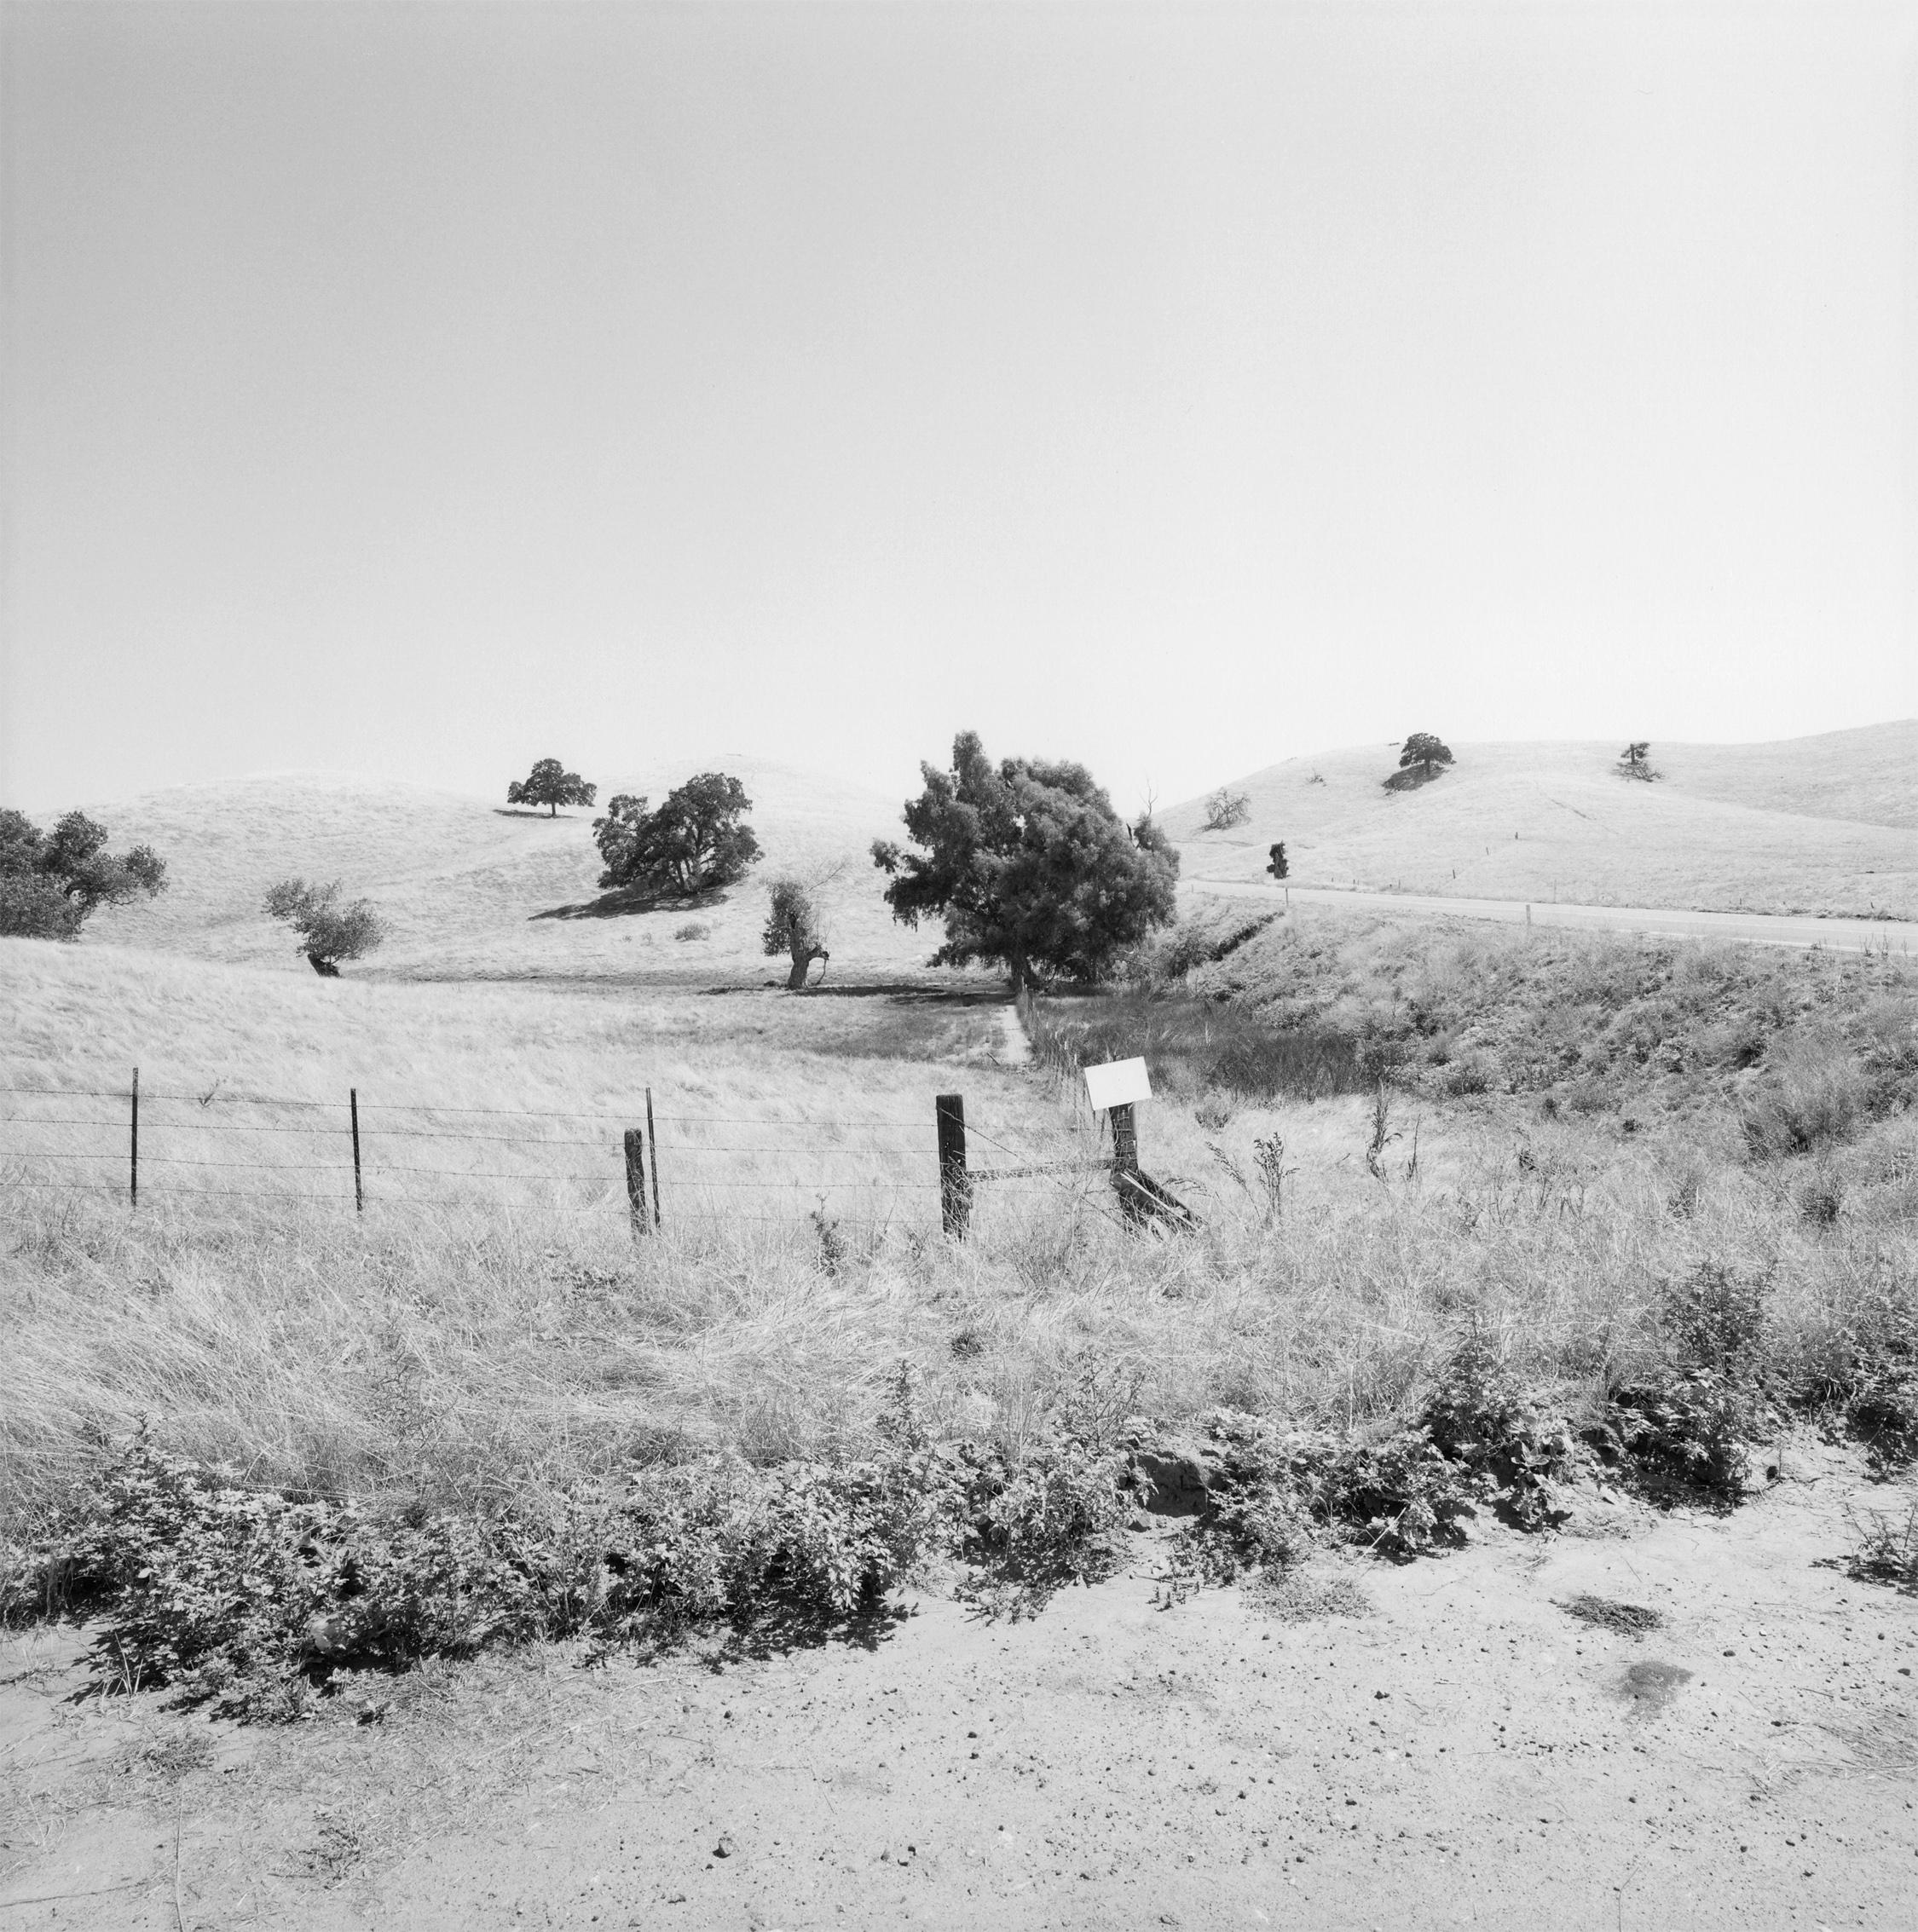 Mariposa County 3